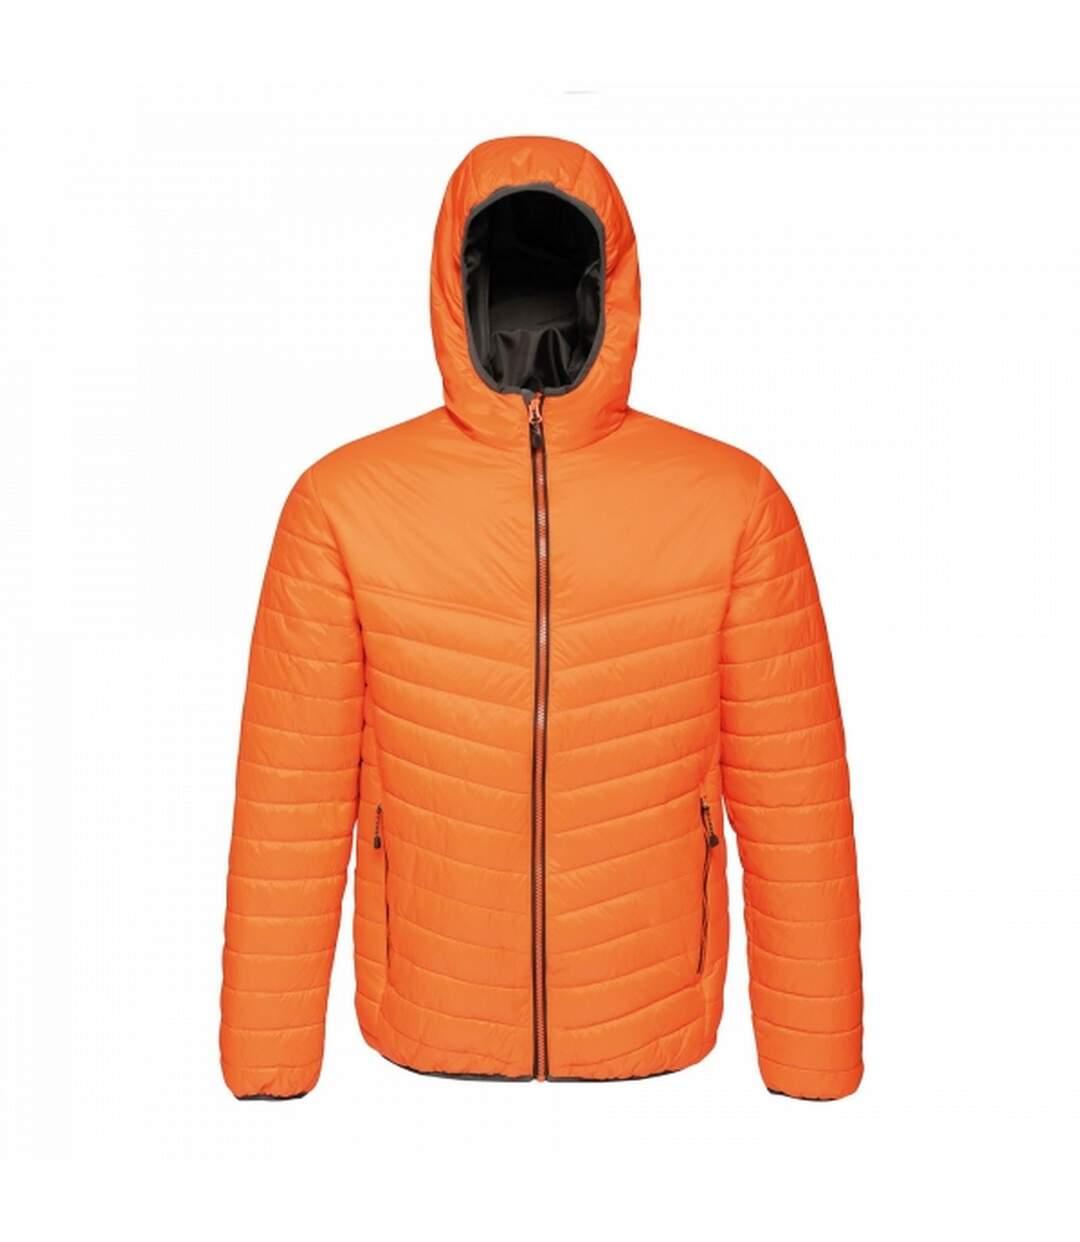 Regatta Mens Acadia II Hooded Jacket (Graphite Black) - UTRG3745